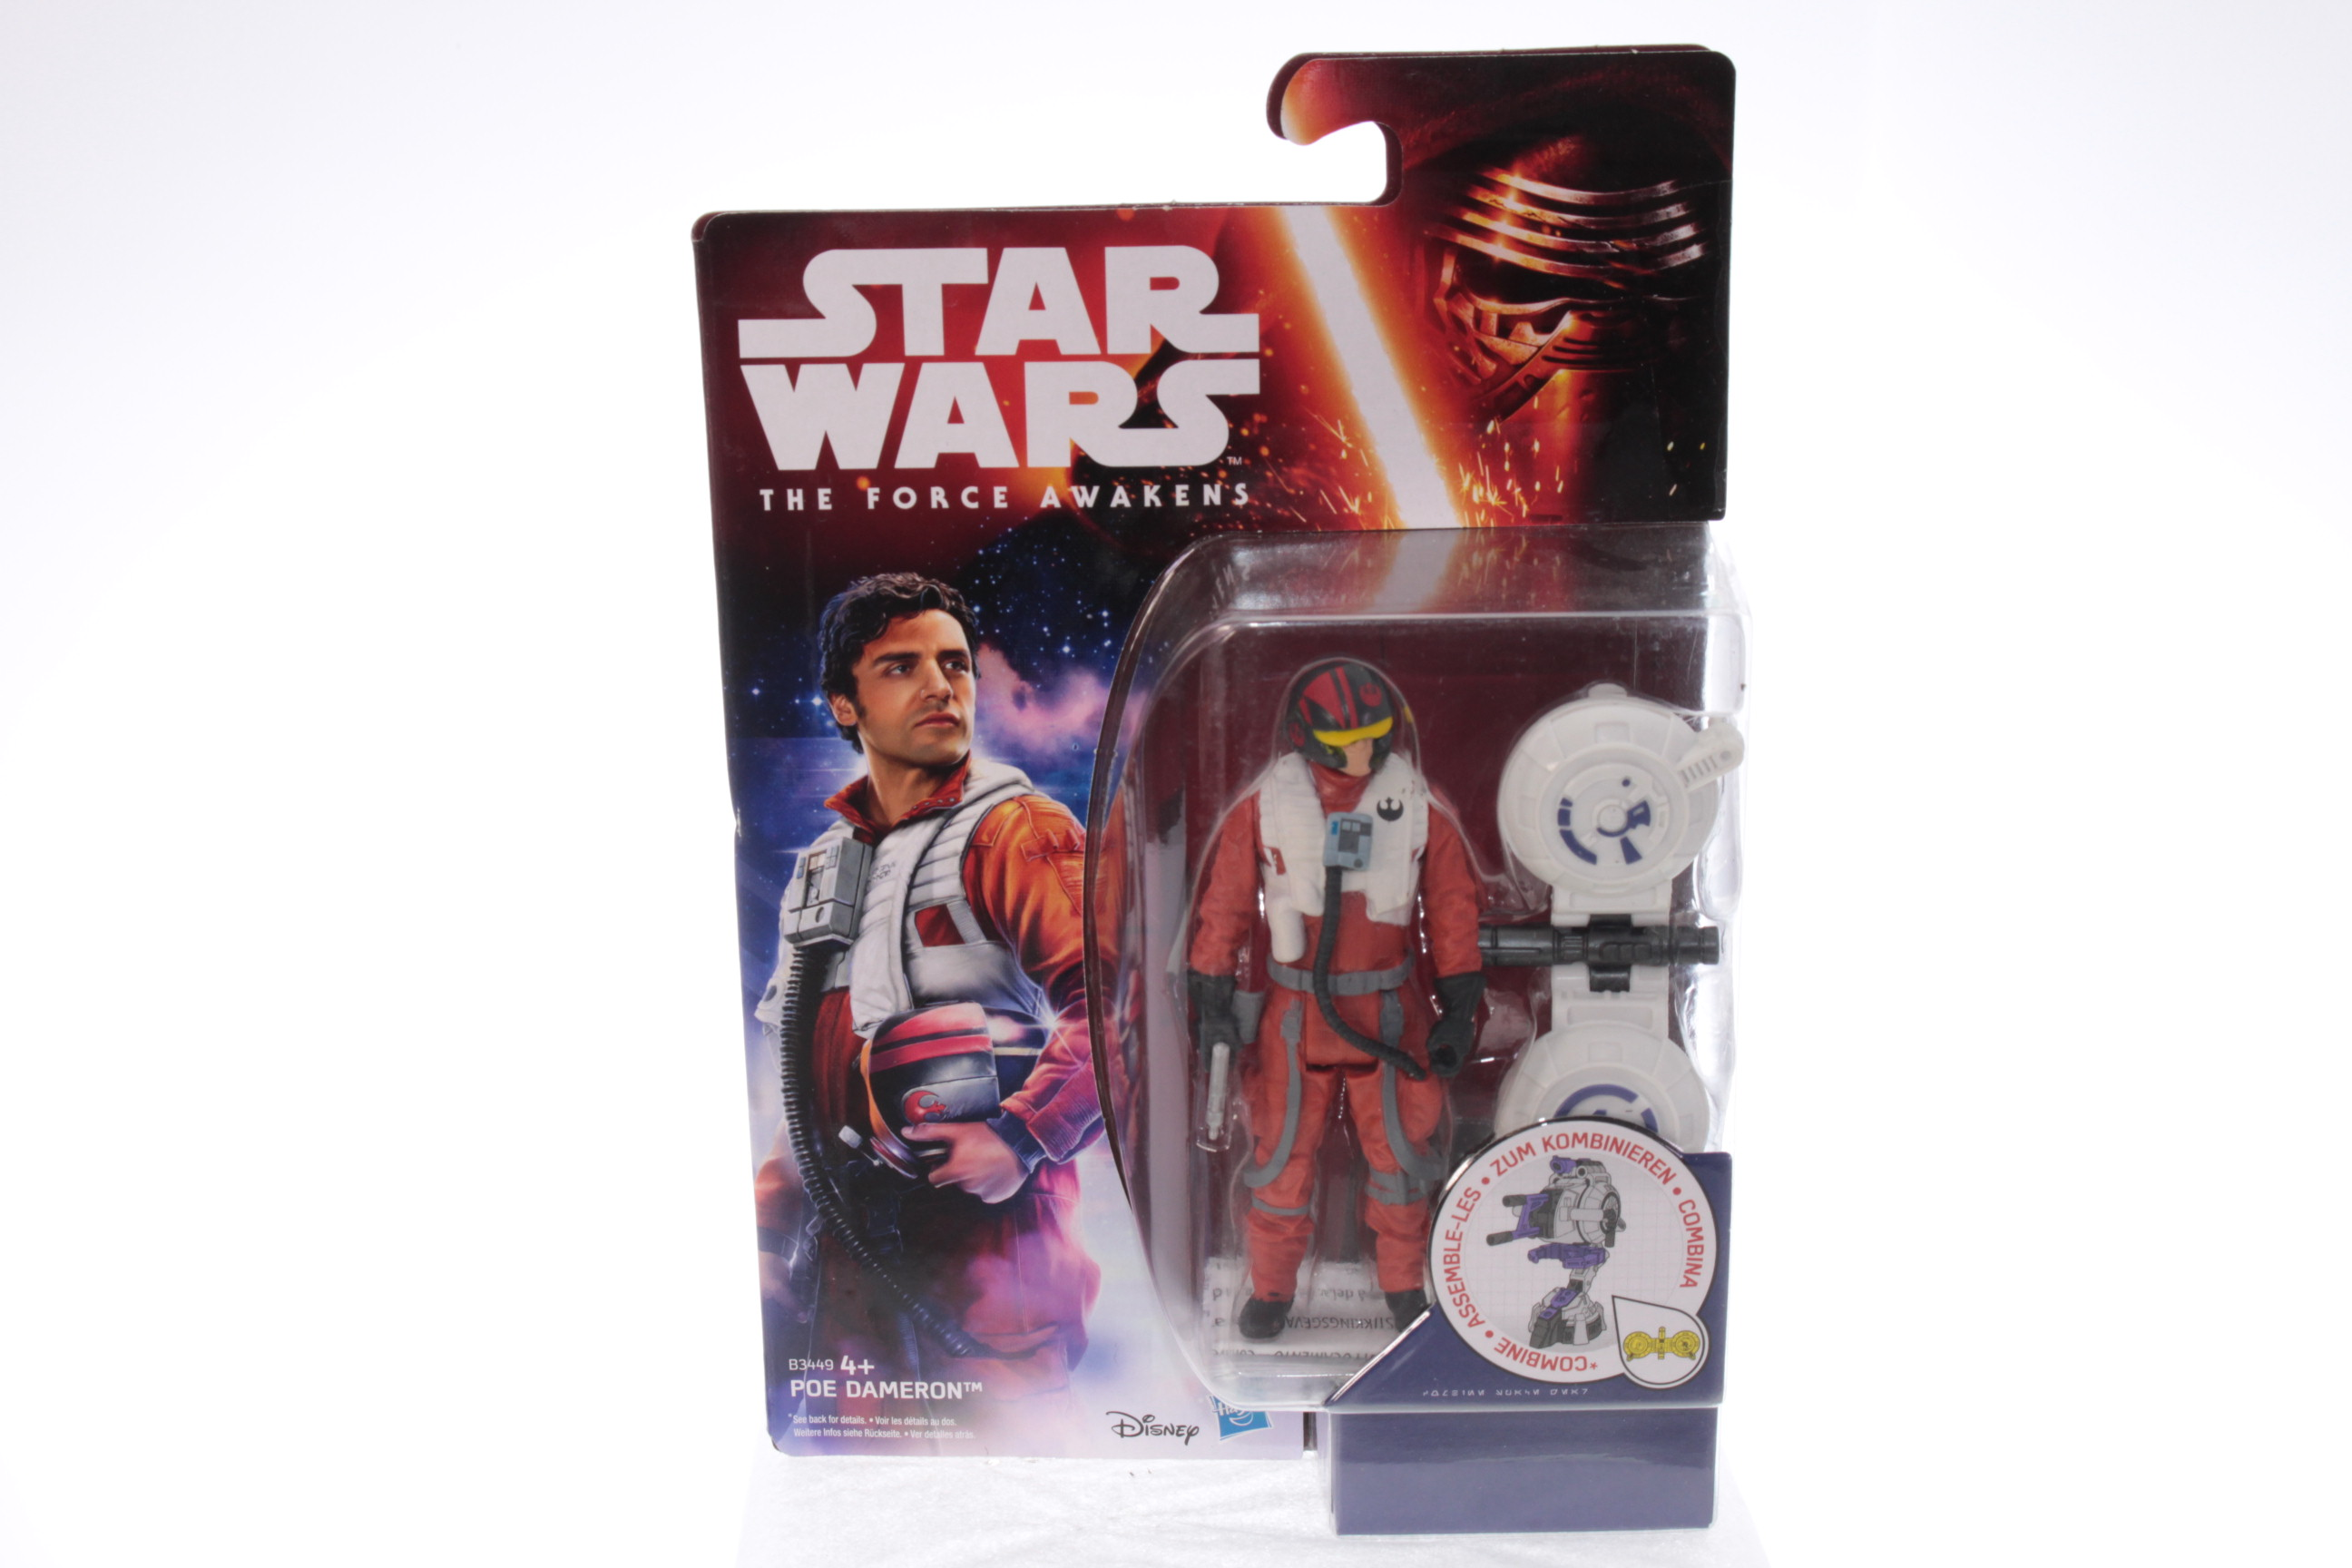 Star Wars The Last Jedi Poe Dameron Resistance Pilot 3.75 inch MISB